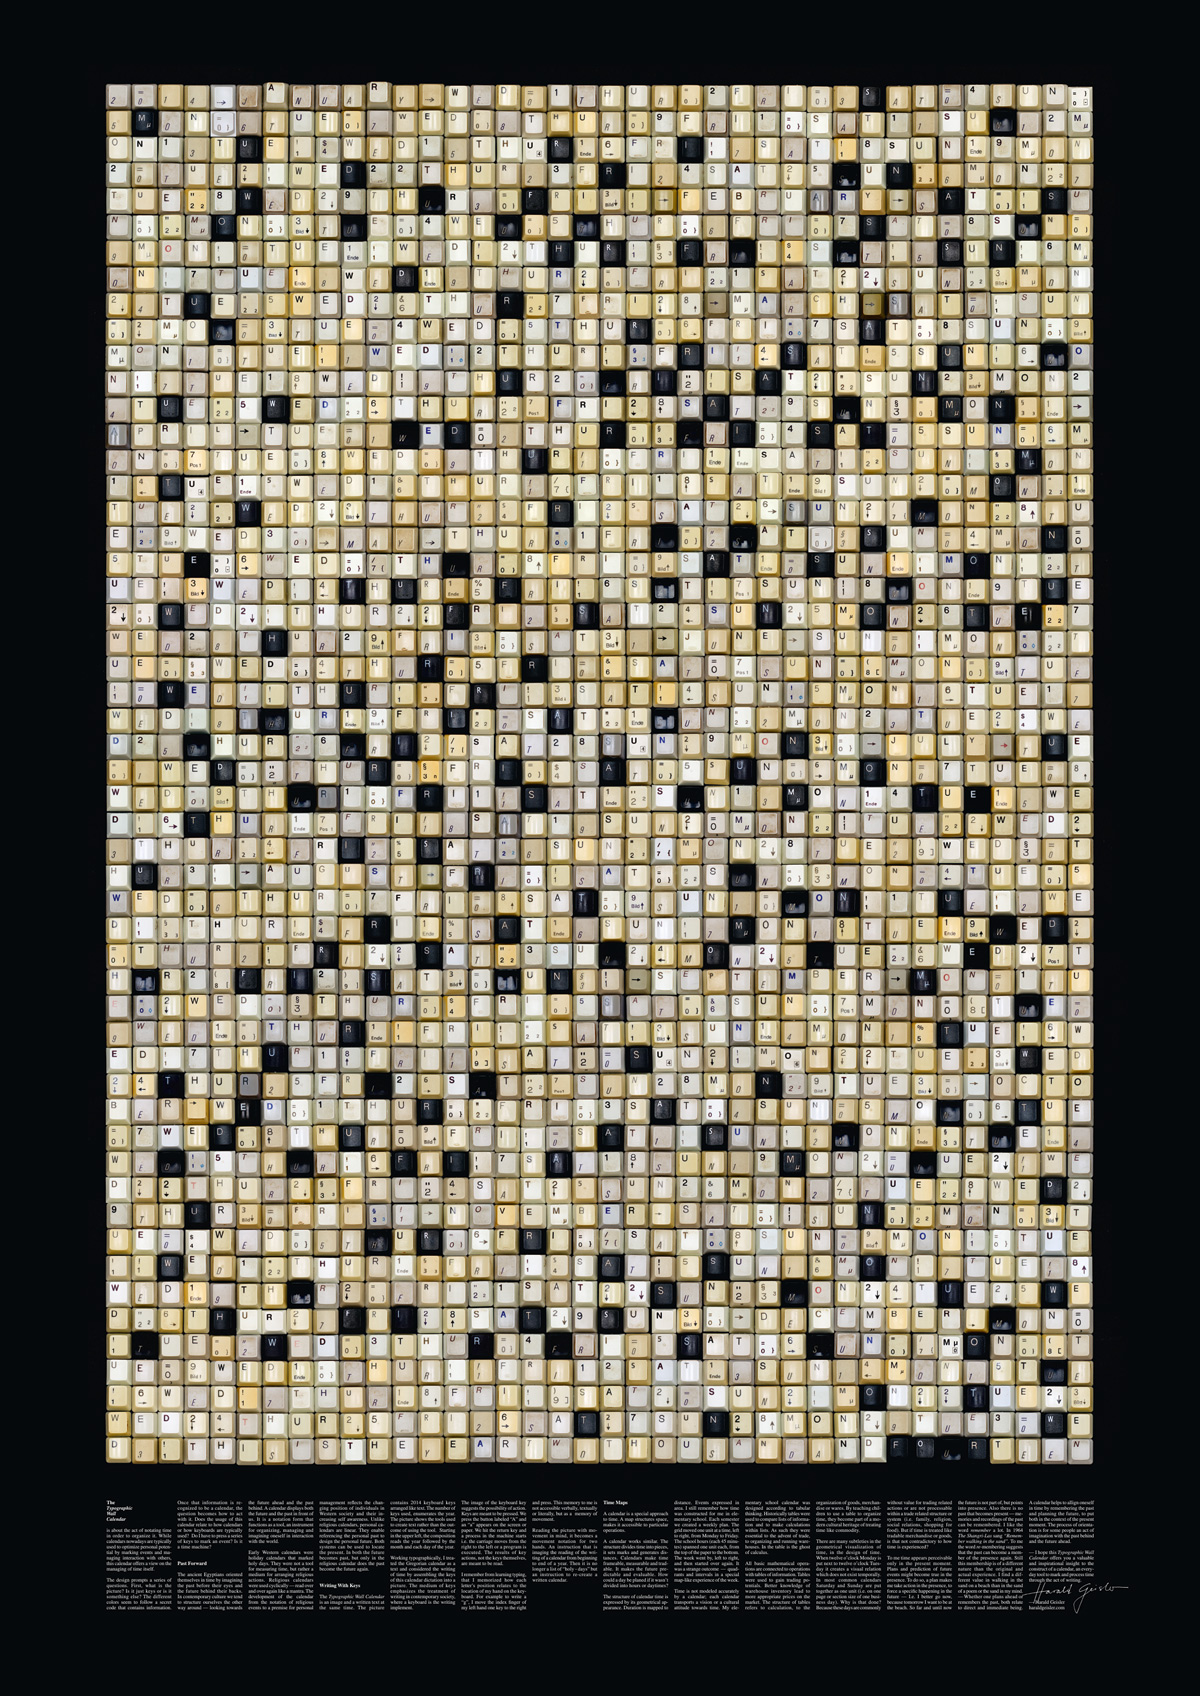 2014 Typograhic Wall Calendar